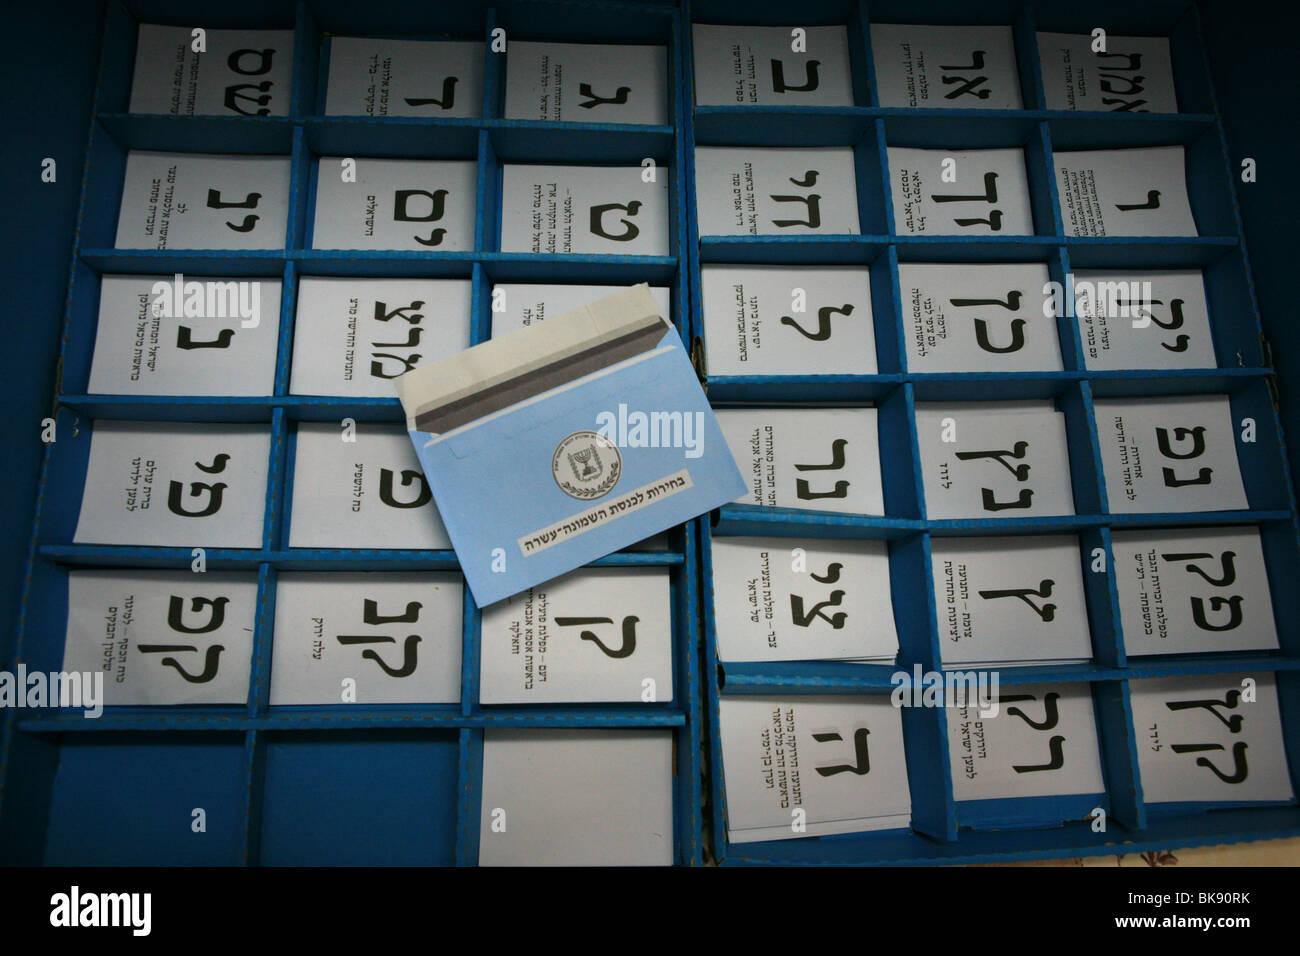 Israel, Kfar Yona, The voting booth and ballots - Stock Image